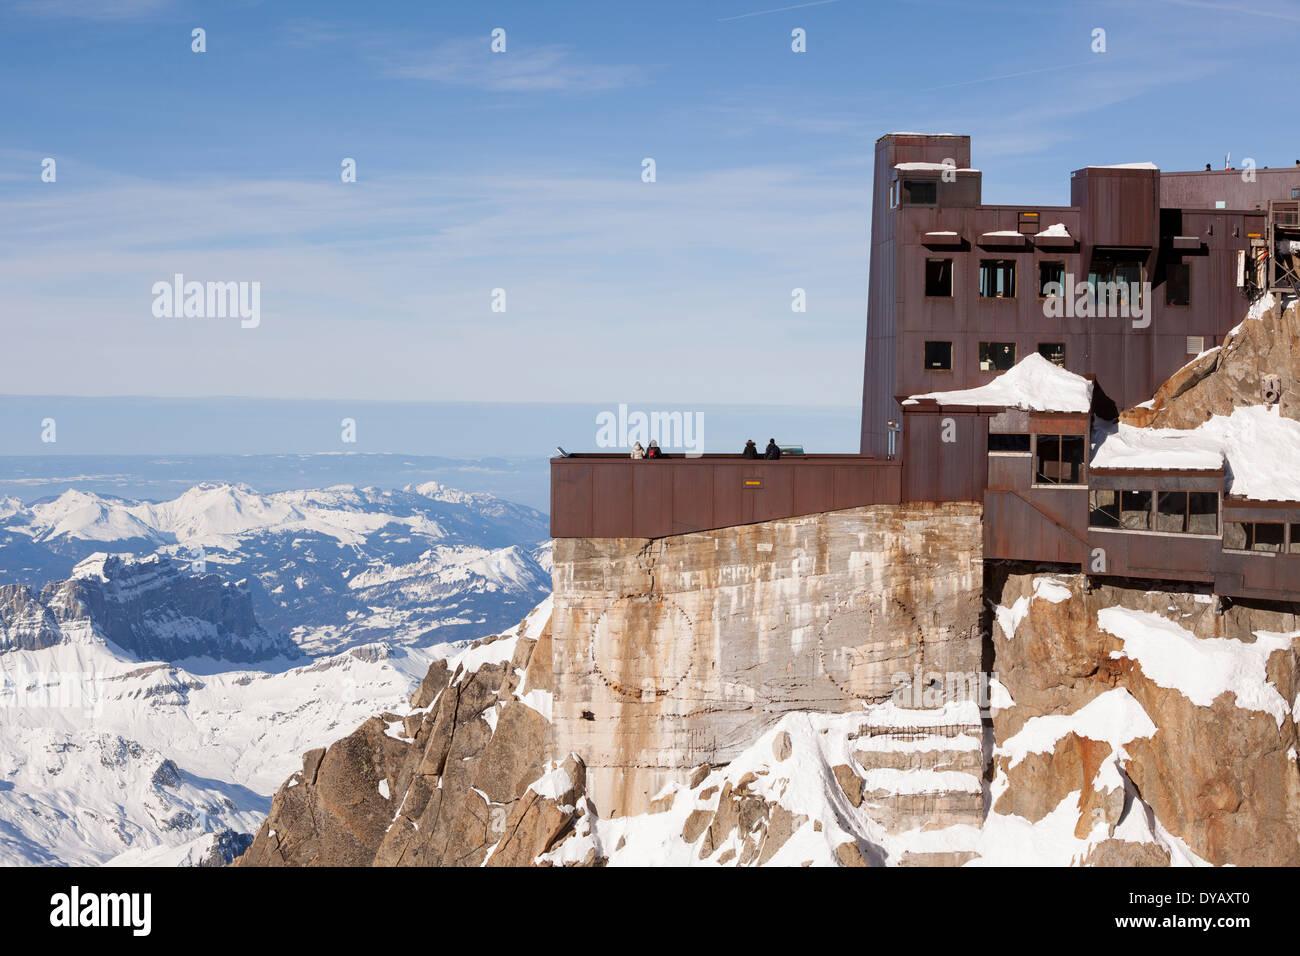 Tourists visit the lookout point building on the Aiguille Du Midi (3842m) mountain top above Chamonix Mont-Blanc. - Stock Image